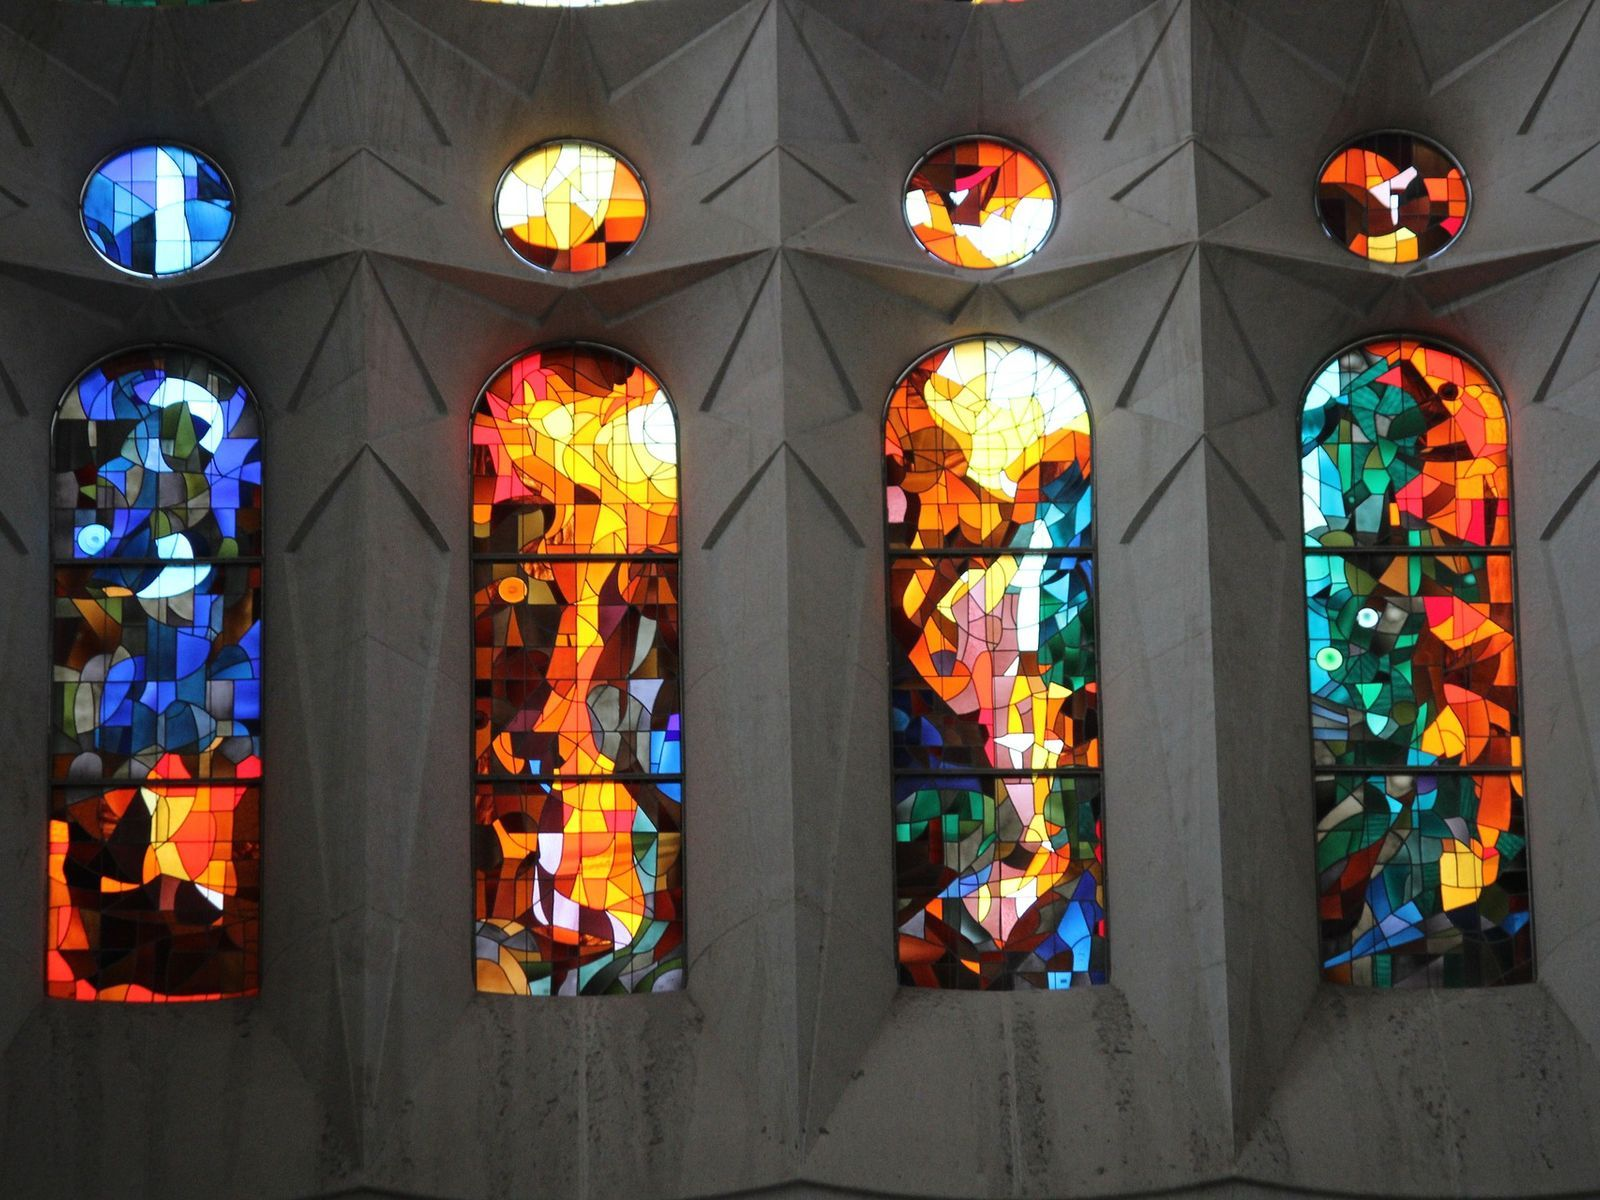 Sagrada Família stained glass windows, Virtual Tour of Gaudi's Barcelona